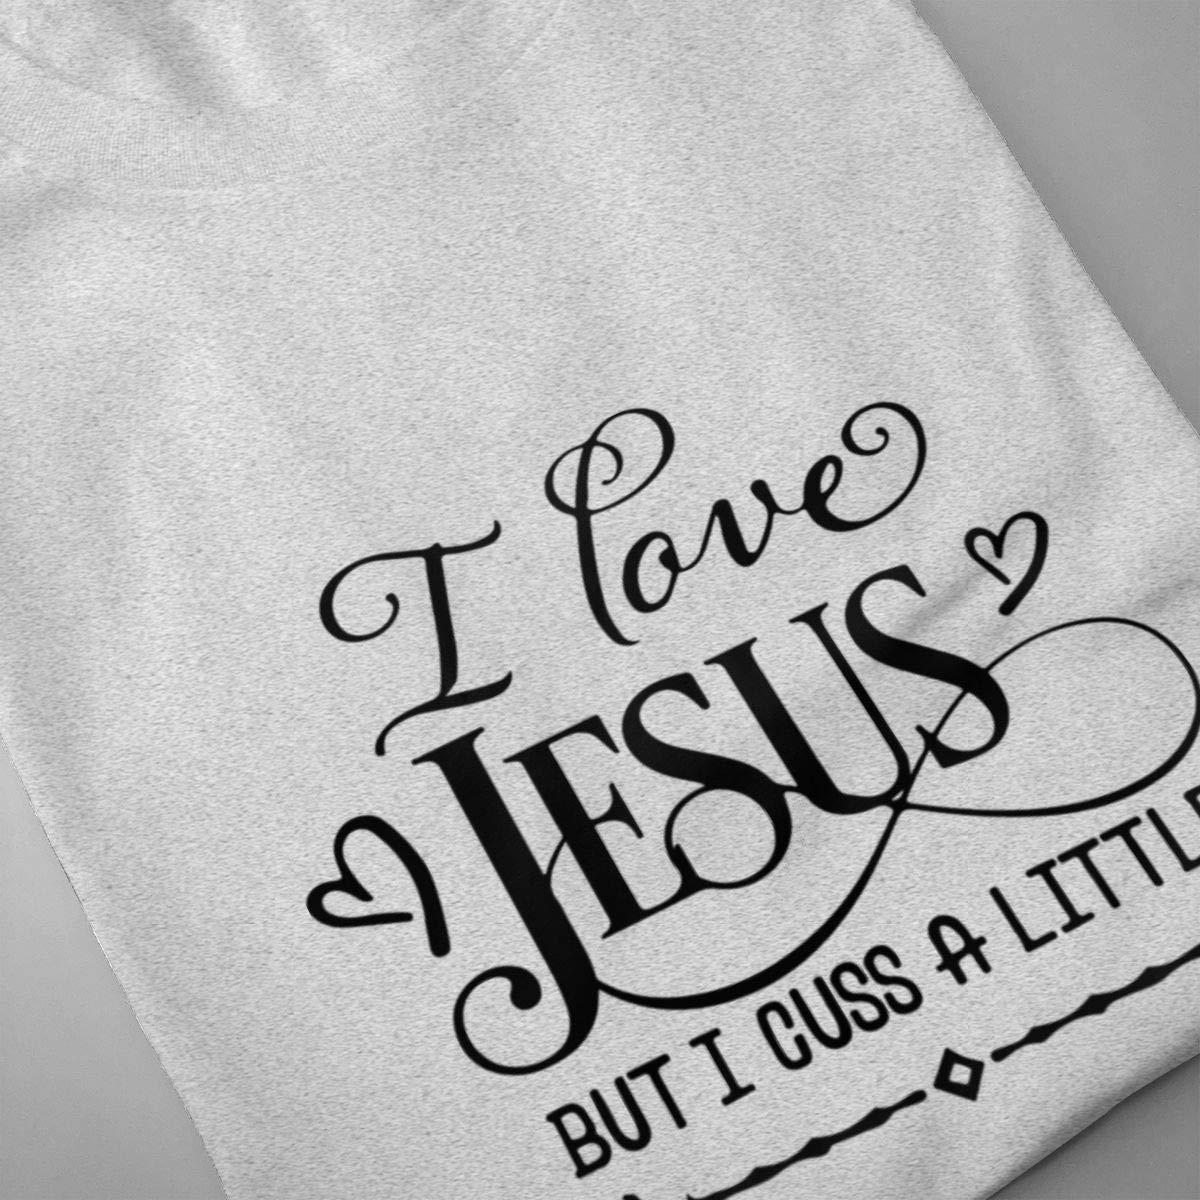 Luxendary Men Logo I Love Jesus But I Cuss A Little Funny Running Round Neck Short Sleeve Tee